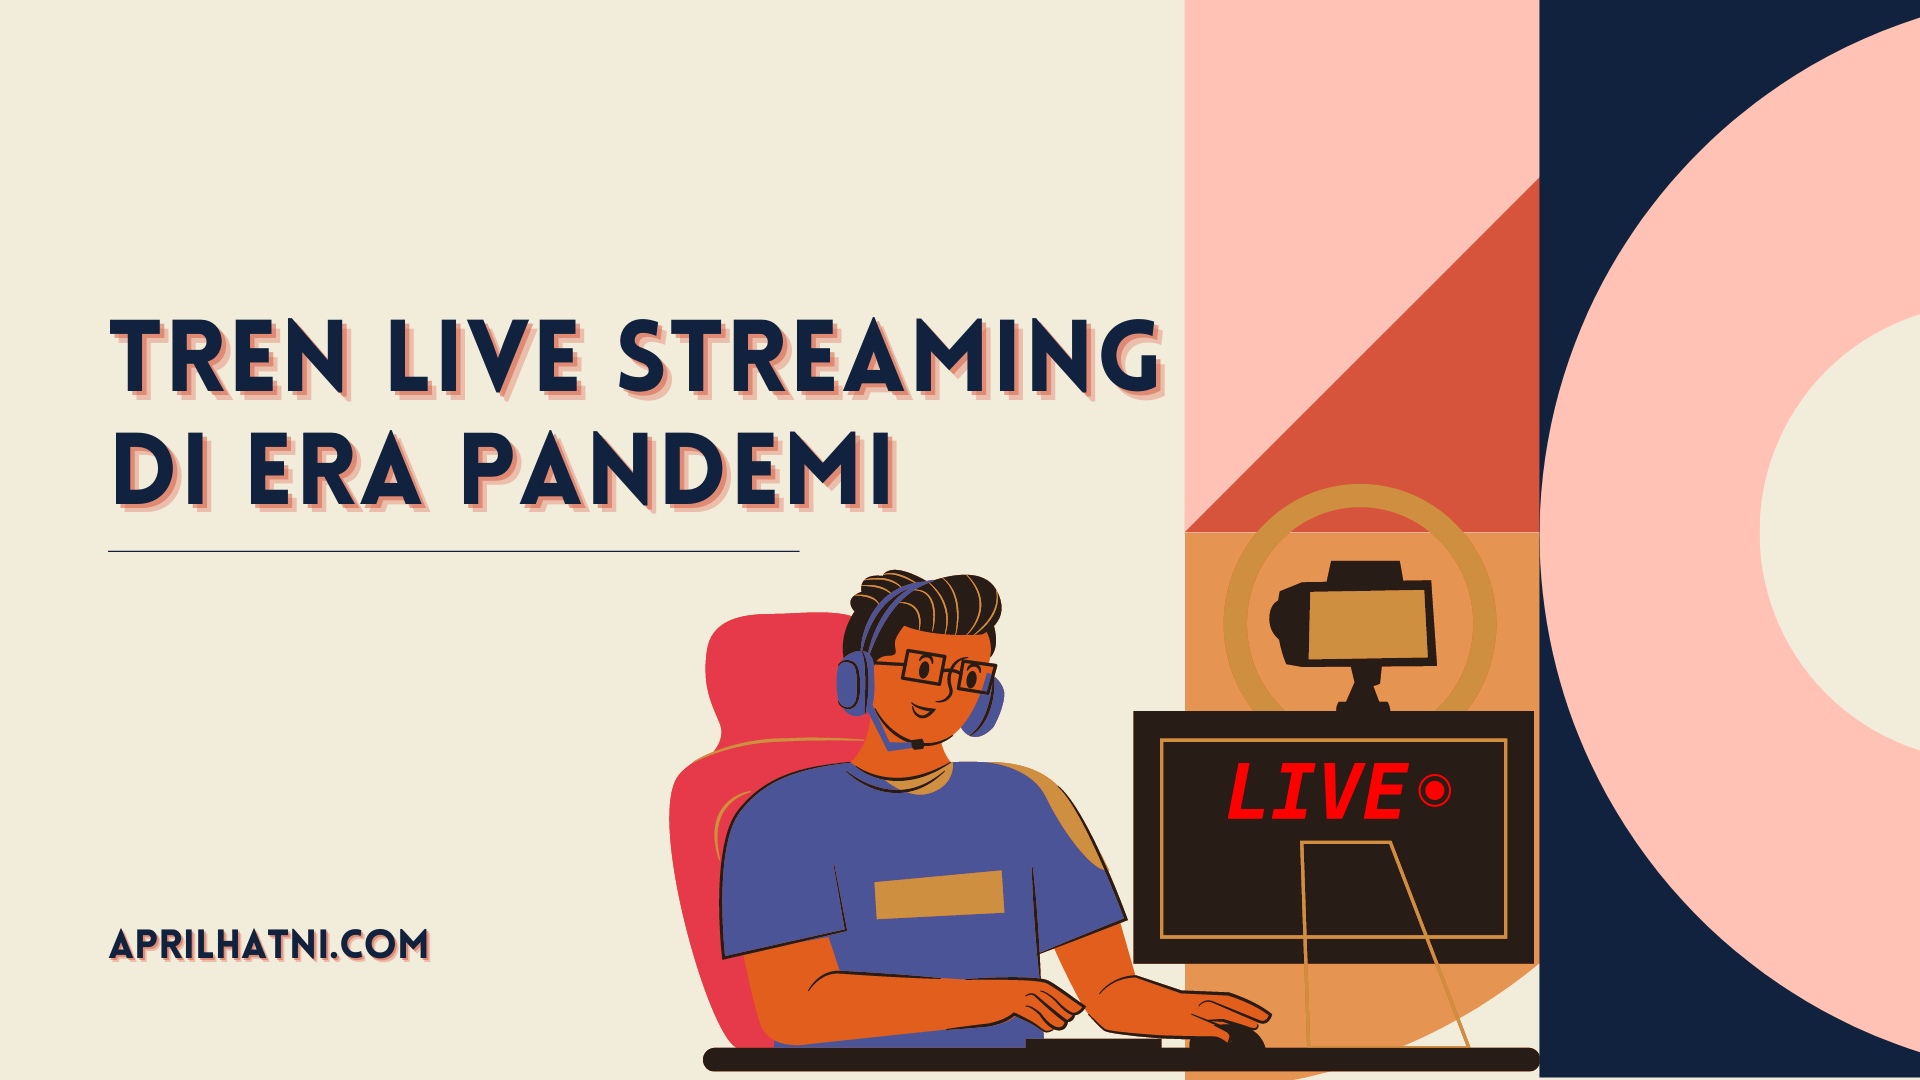 tren live streaming era pandemi